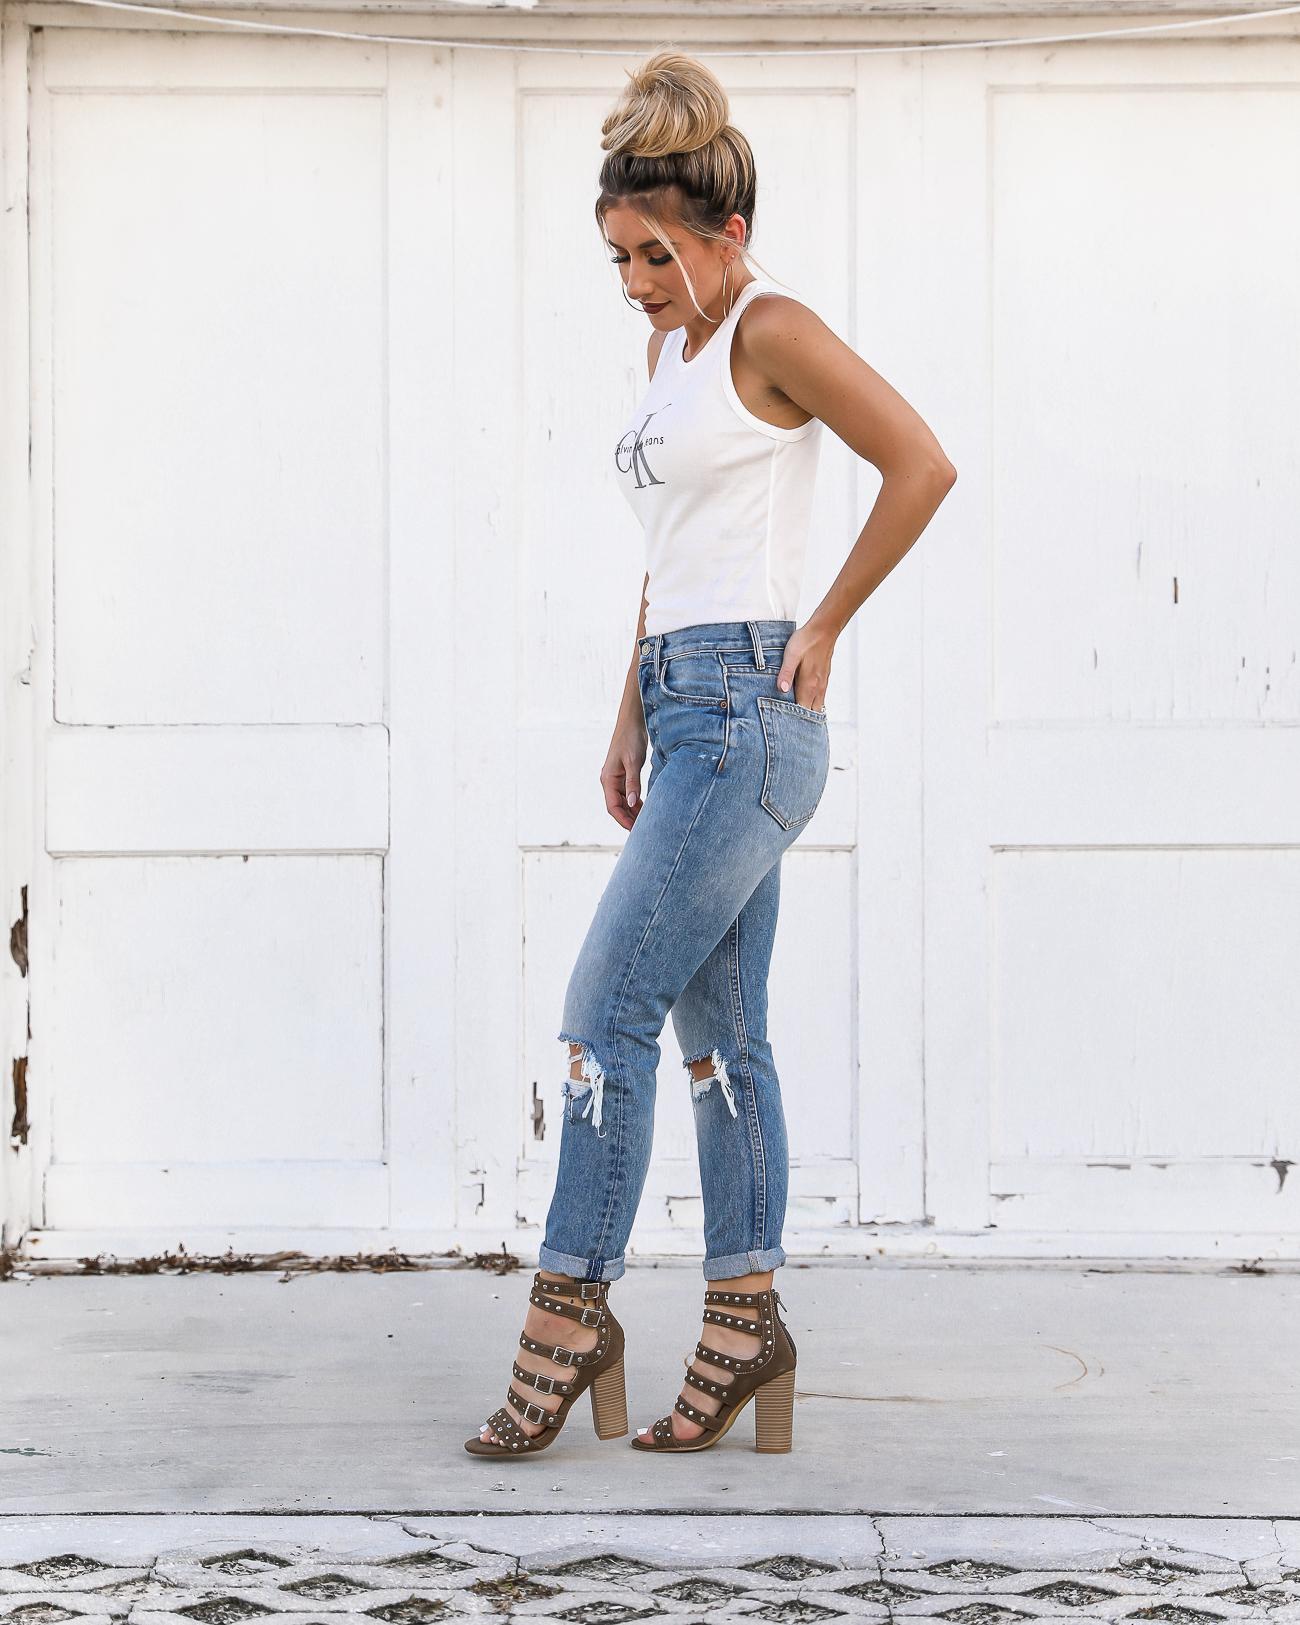 CK Tank Grlfrnd Distressed Jeans 90's style Calvin Klein tank top